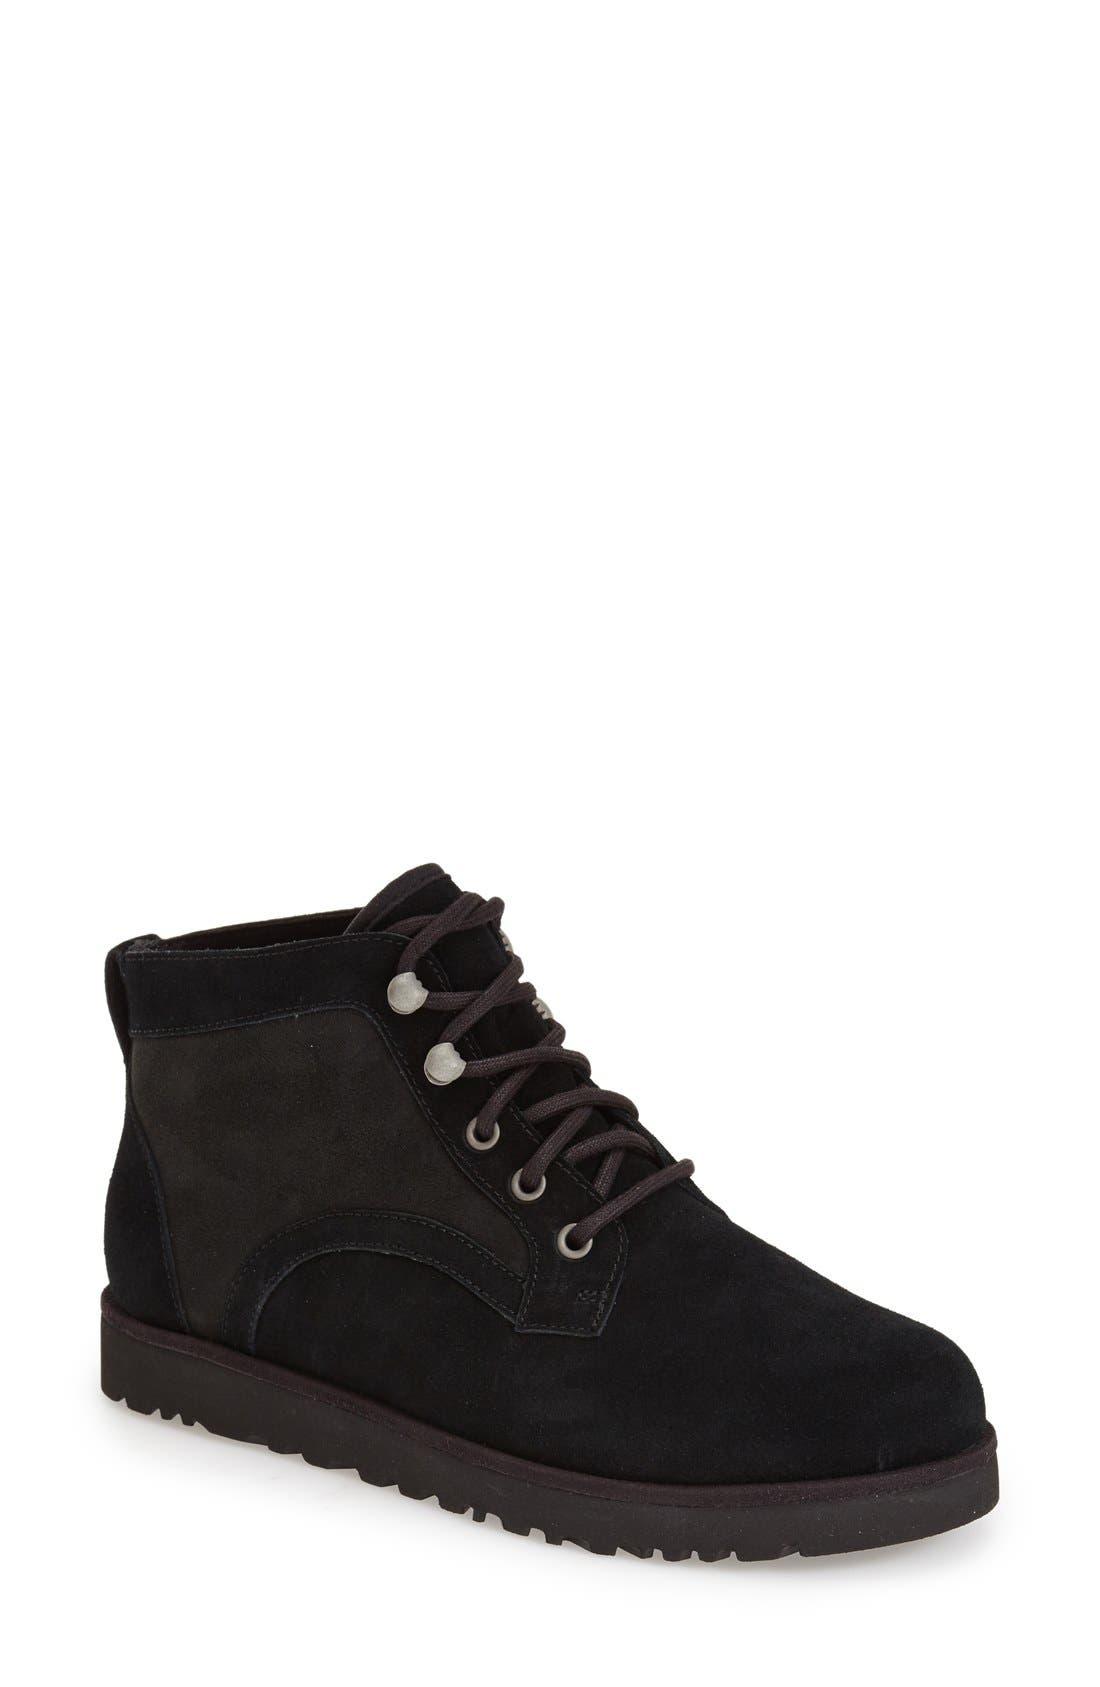 Alternate Image 1 Selected - UGG® Bethany - Classic Slim™ Water Resistant Chukka Boot (Women)